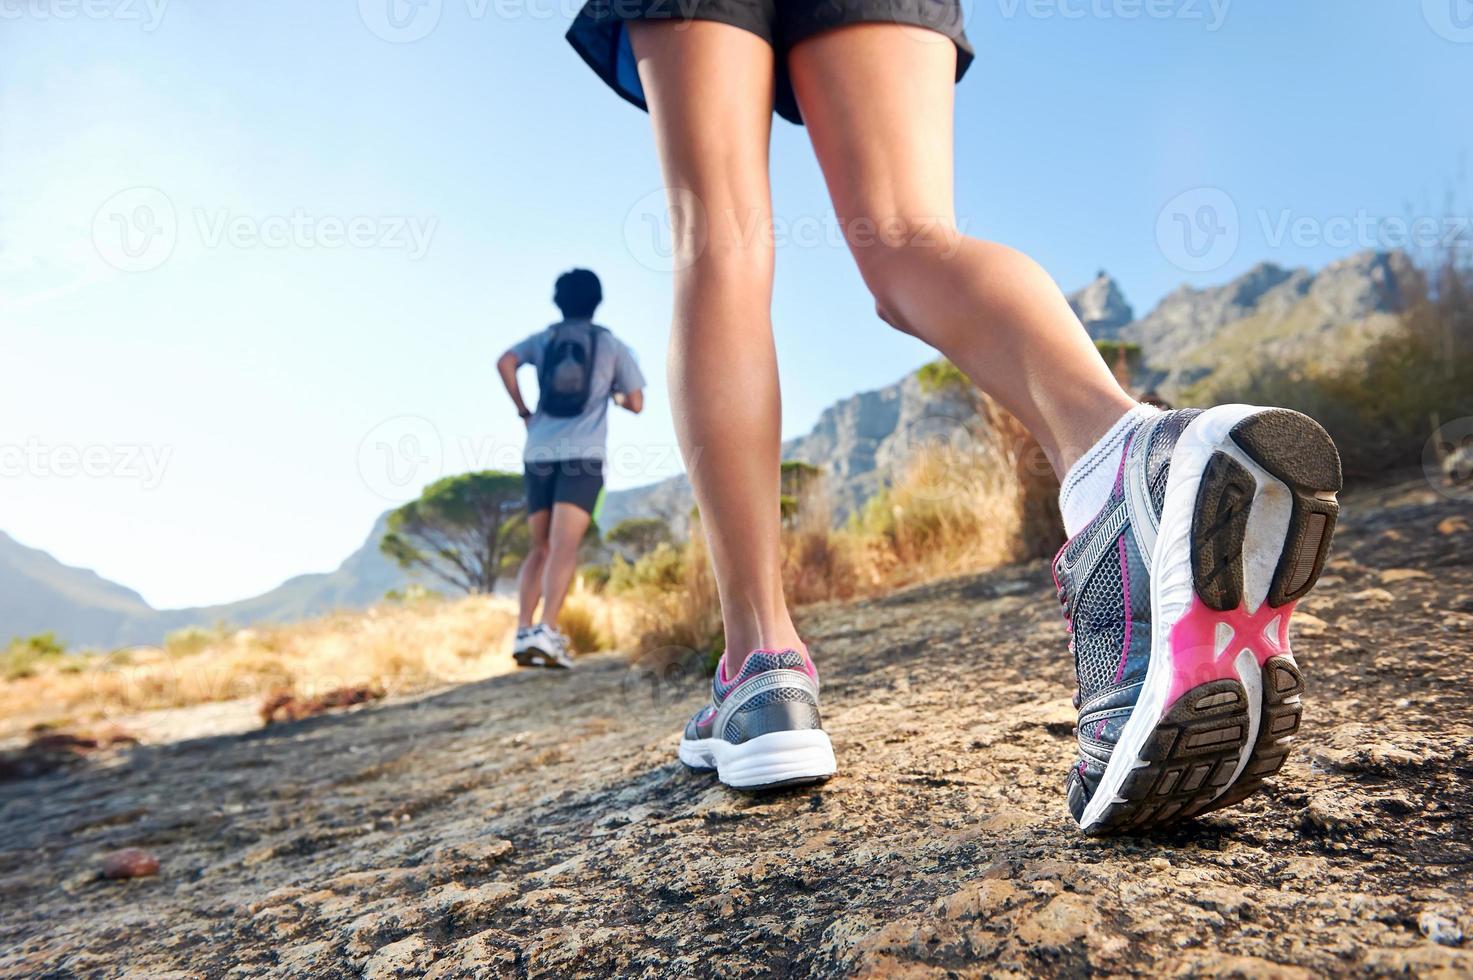 fötter springer utomhus foto